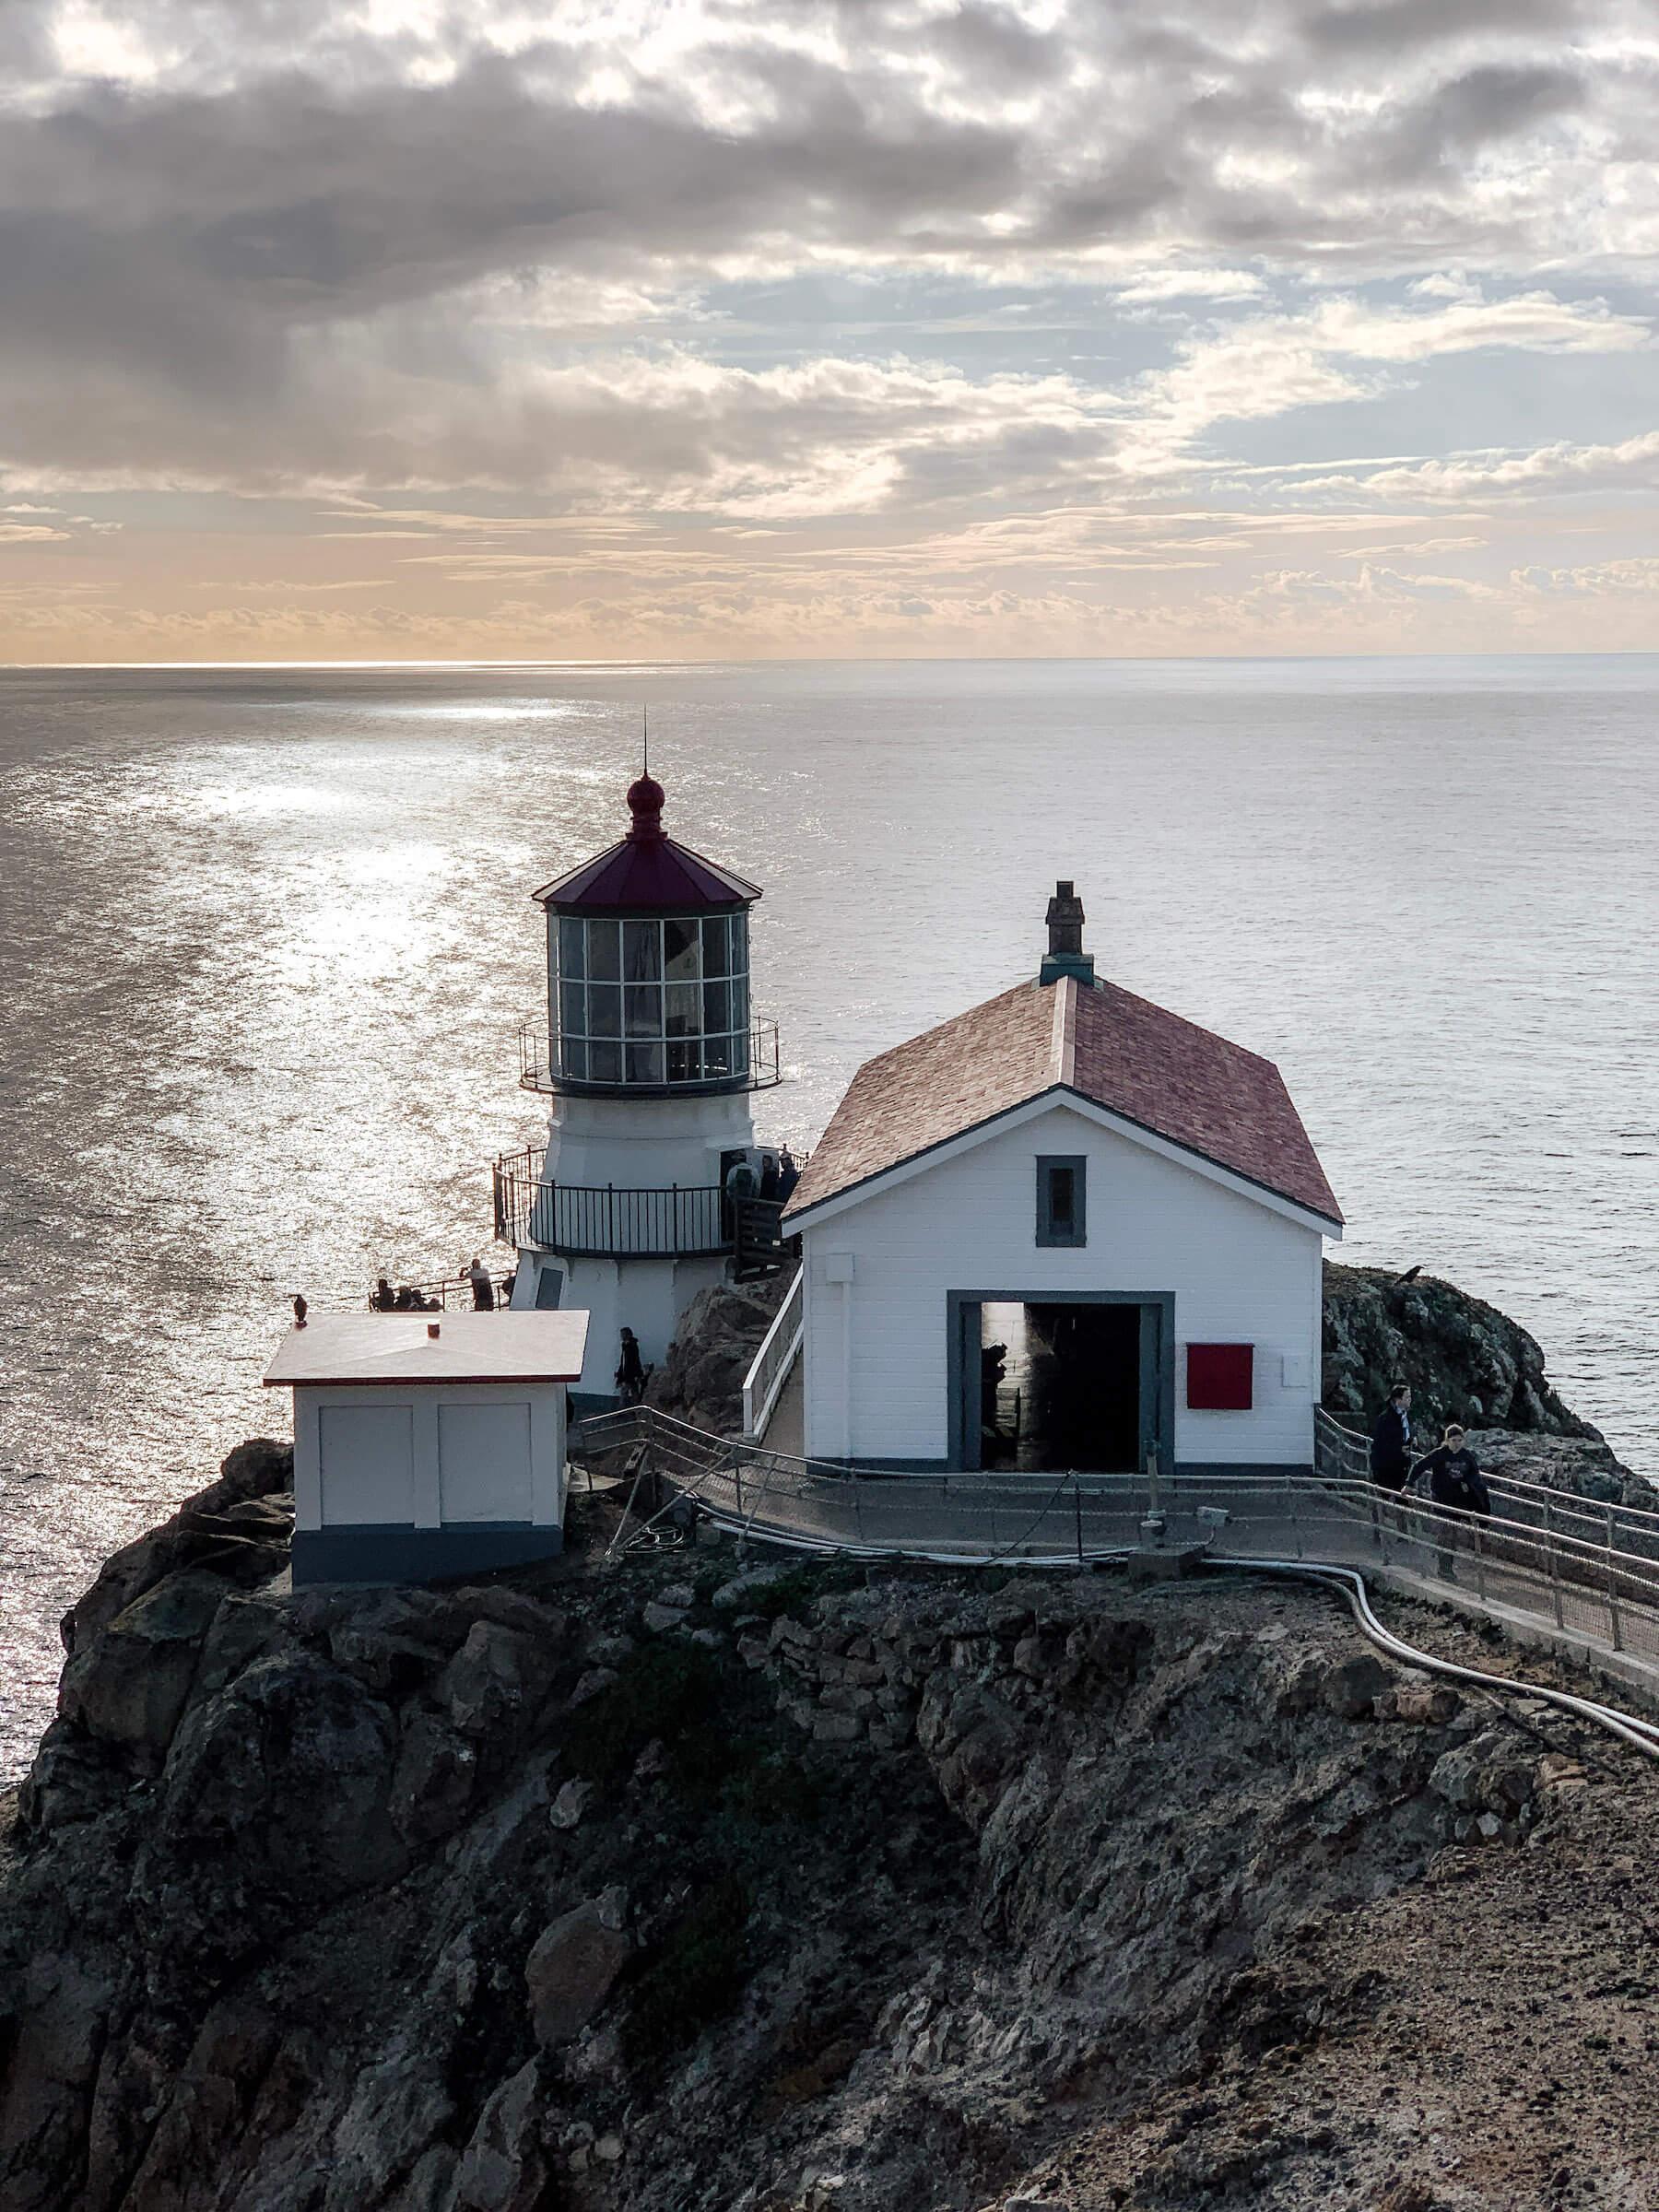 Point Reyes National Seashore - méconnus incontournables San Francisco - voyage en Californie